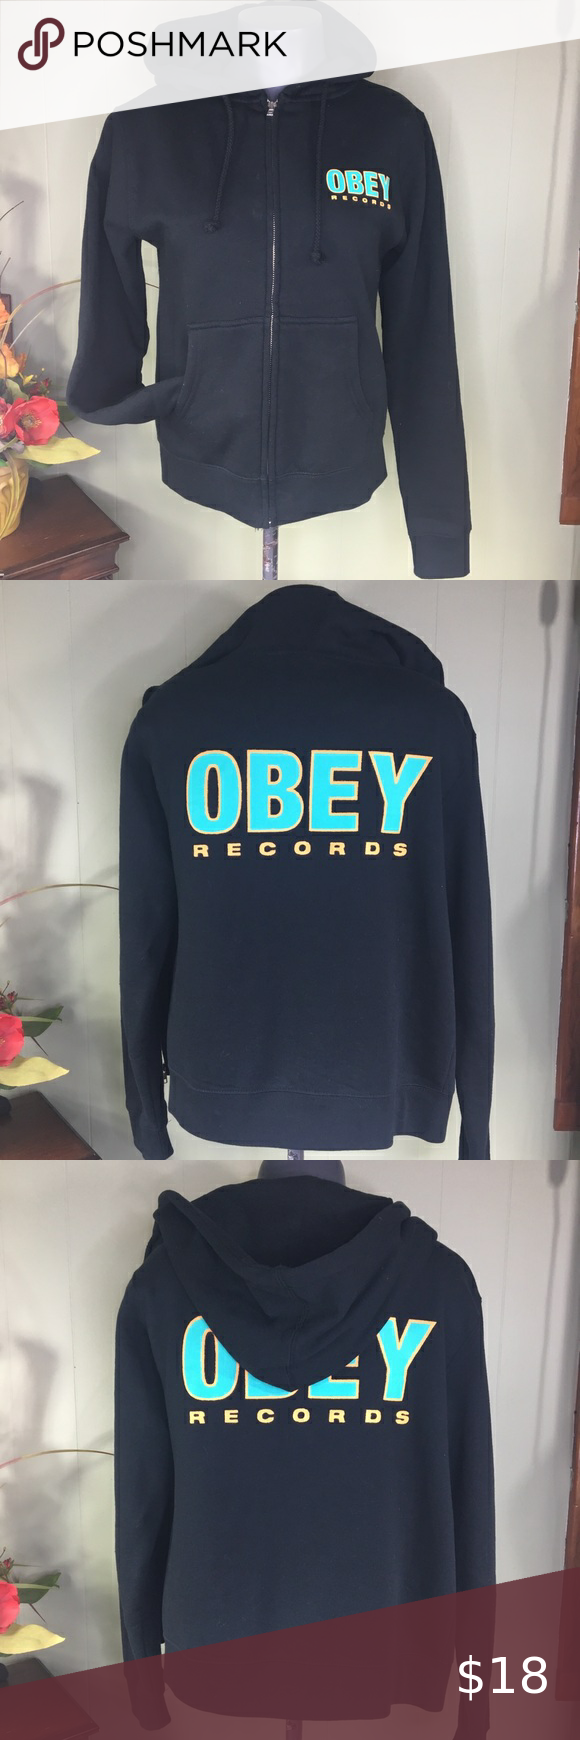 Obey Records Black Hoodie Full Zip Logo Back Sz S Black Hoodie Full Zip Hoodie Sweatshirt Tops